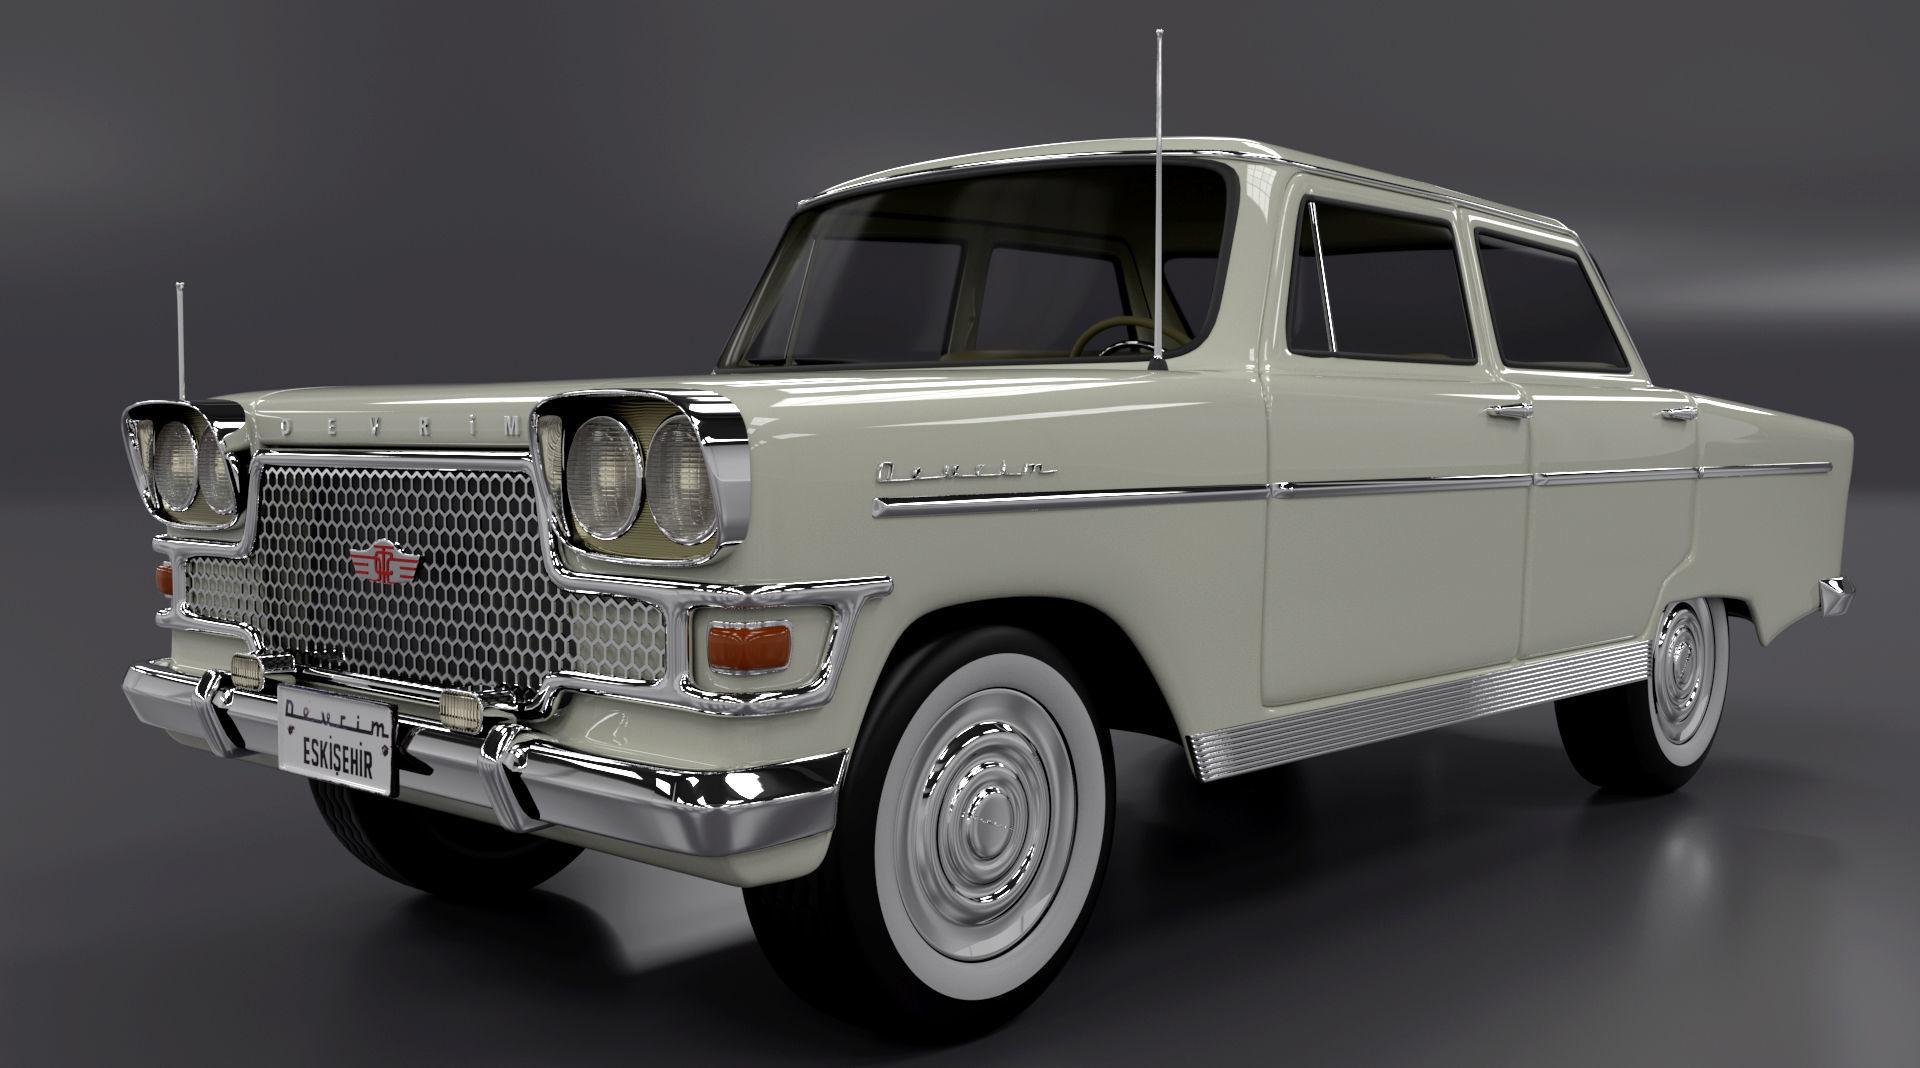 Devrim 1961 first car Turkey Republ